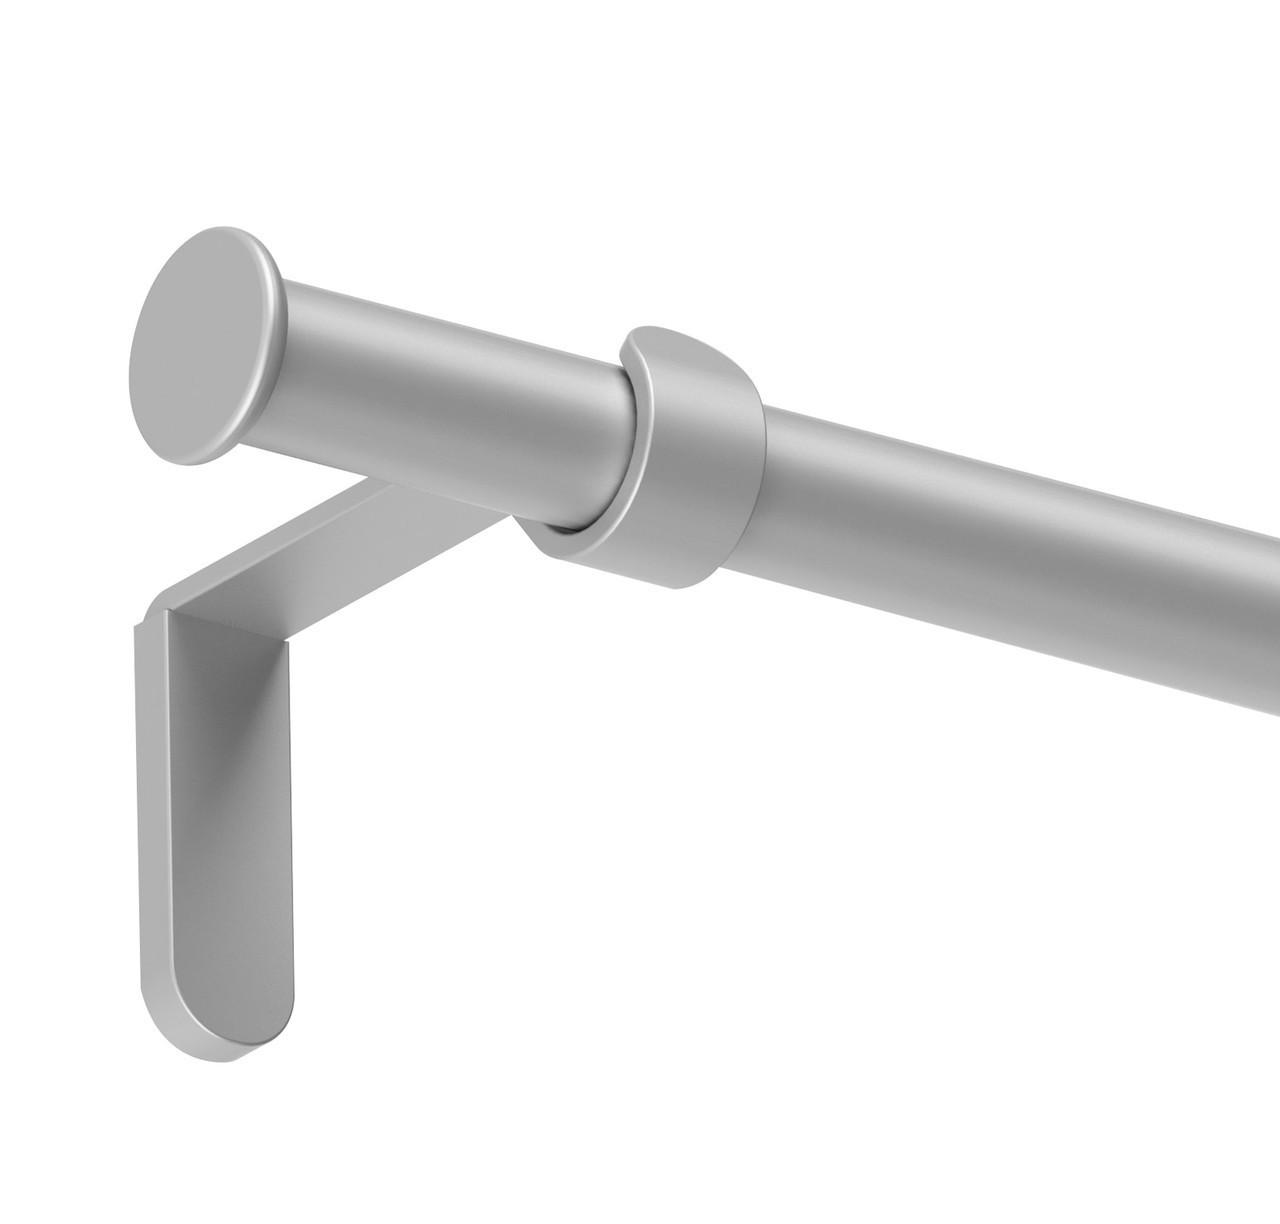 Карниз Mardom метал Осло одинарний сатин 19 мм 240 см (895245)